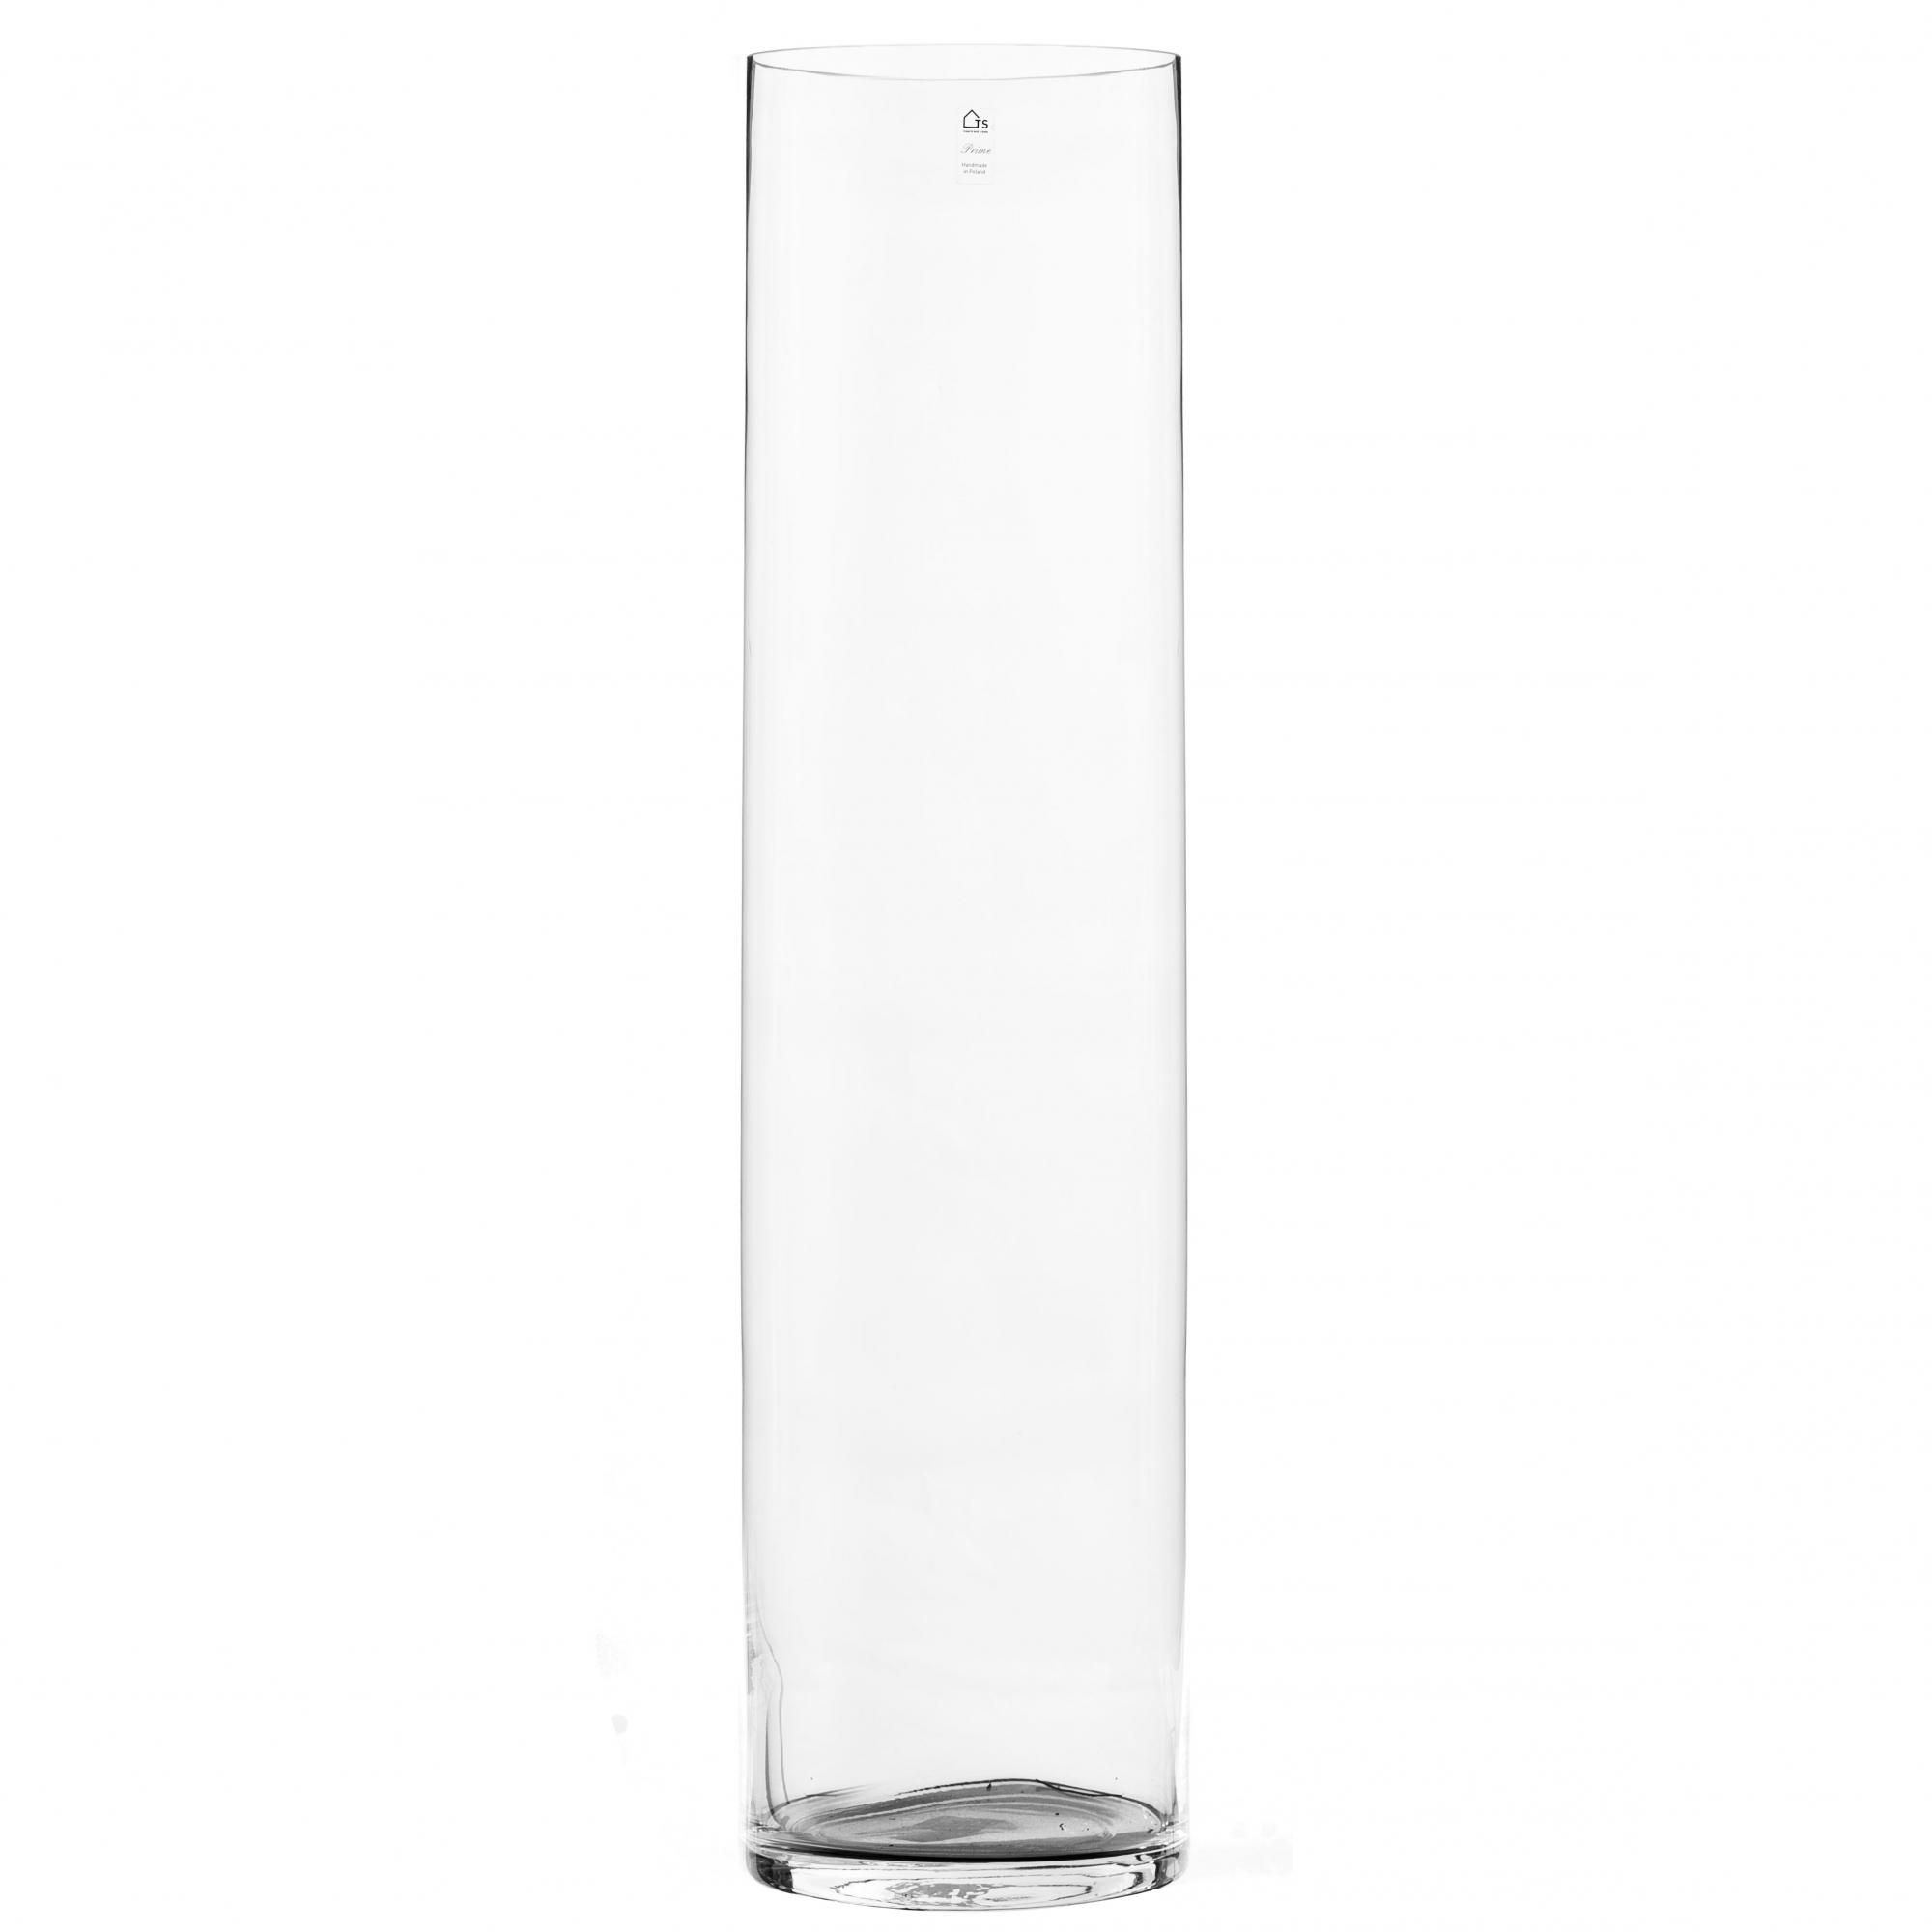 Vaso Cilindro de Vidro Artesanal Polonês 20x120cm